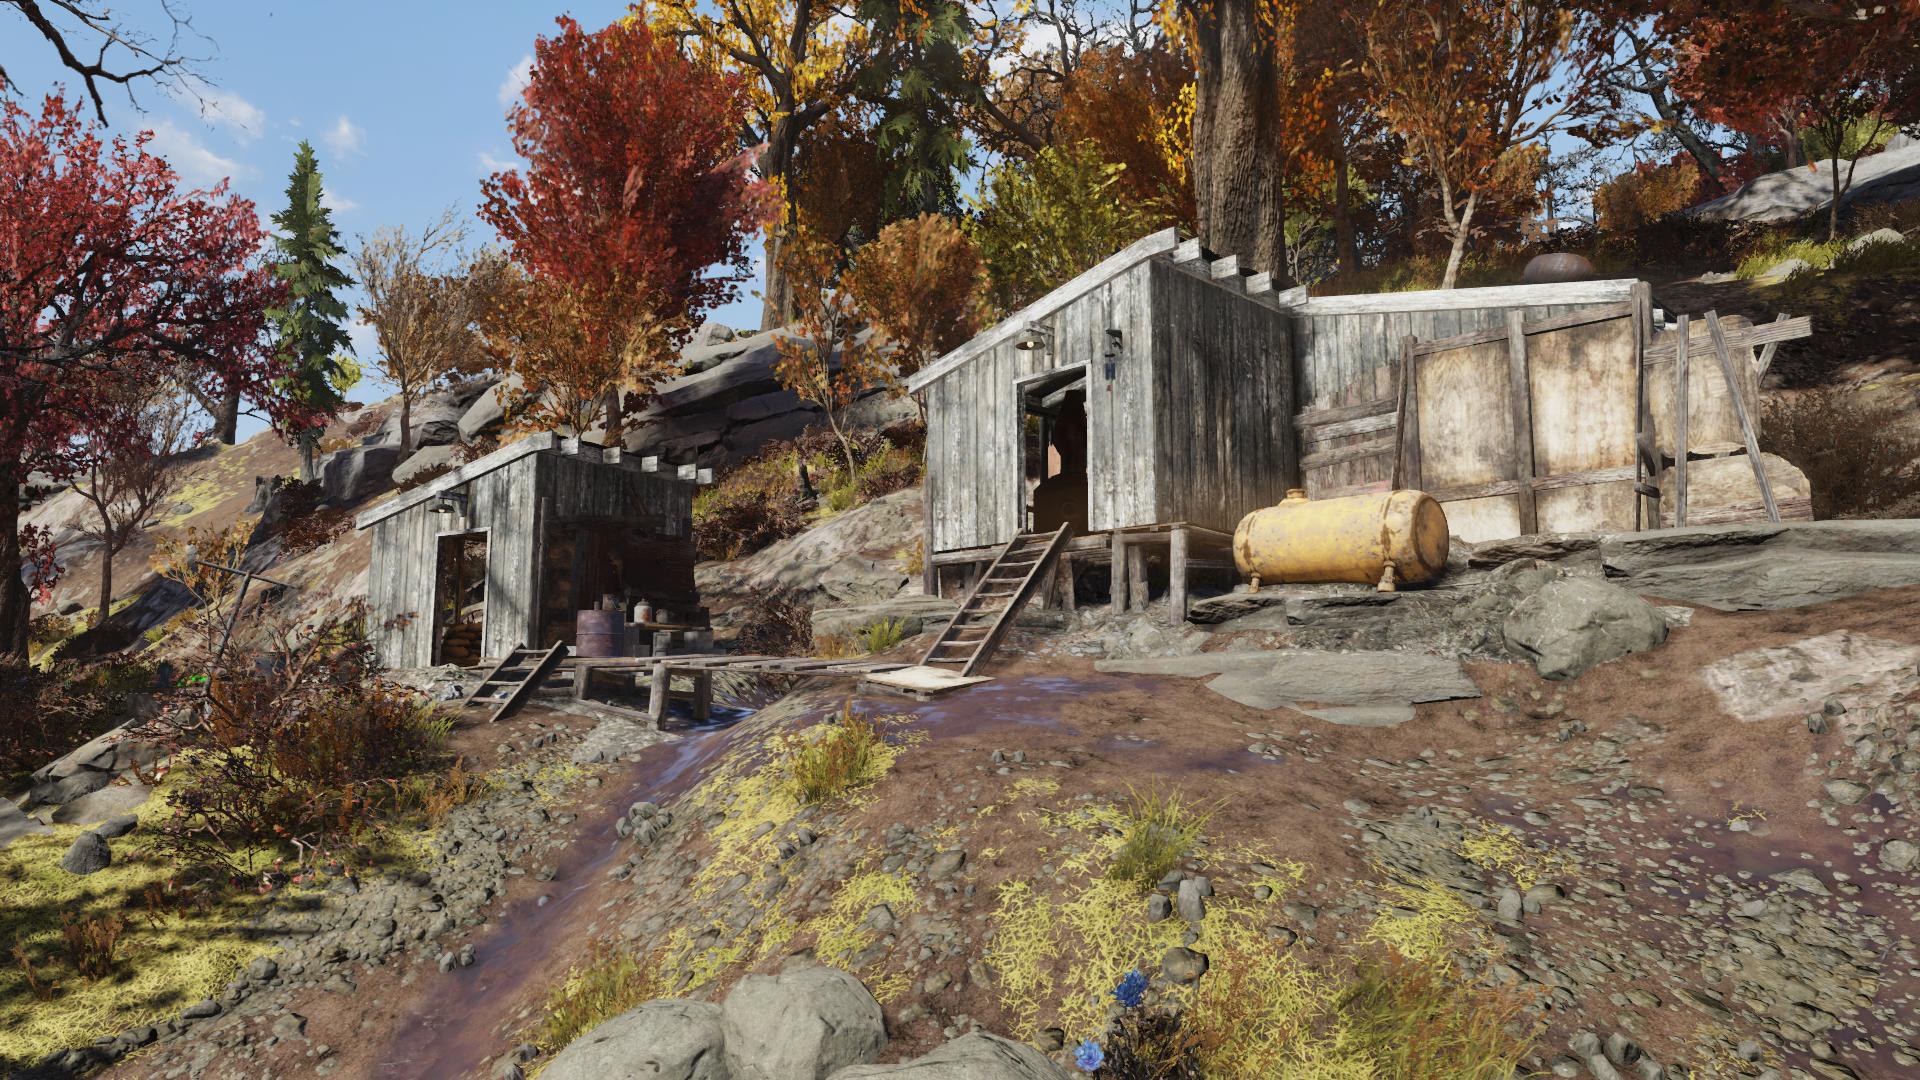 Moonshiner's shack